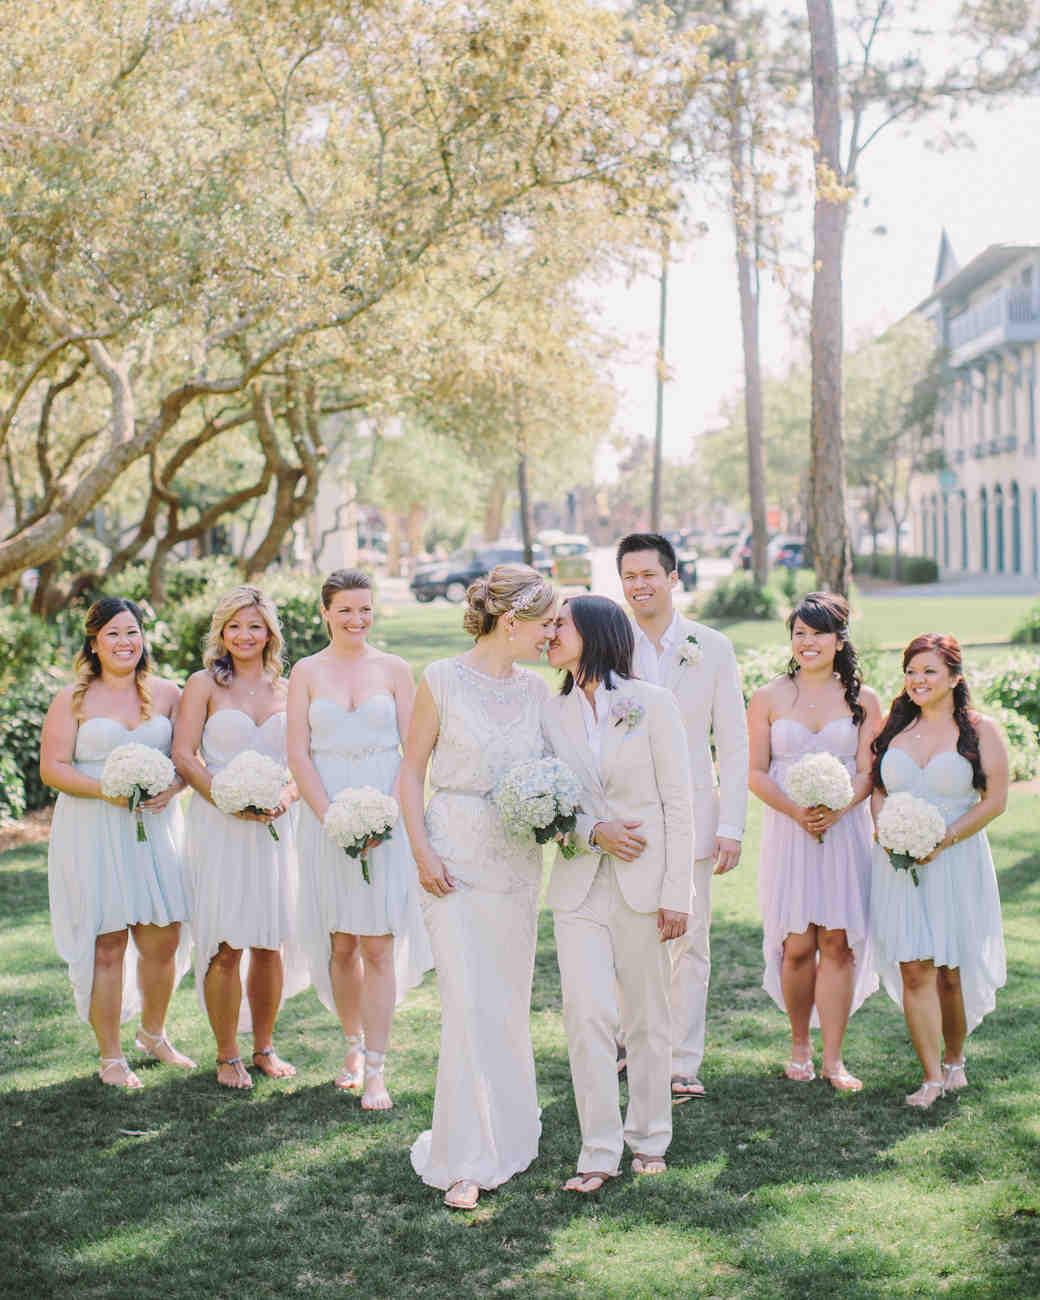 teresa-amanda-wedding-bridalparty-9276-s111694-1114.jpg